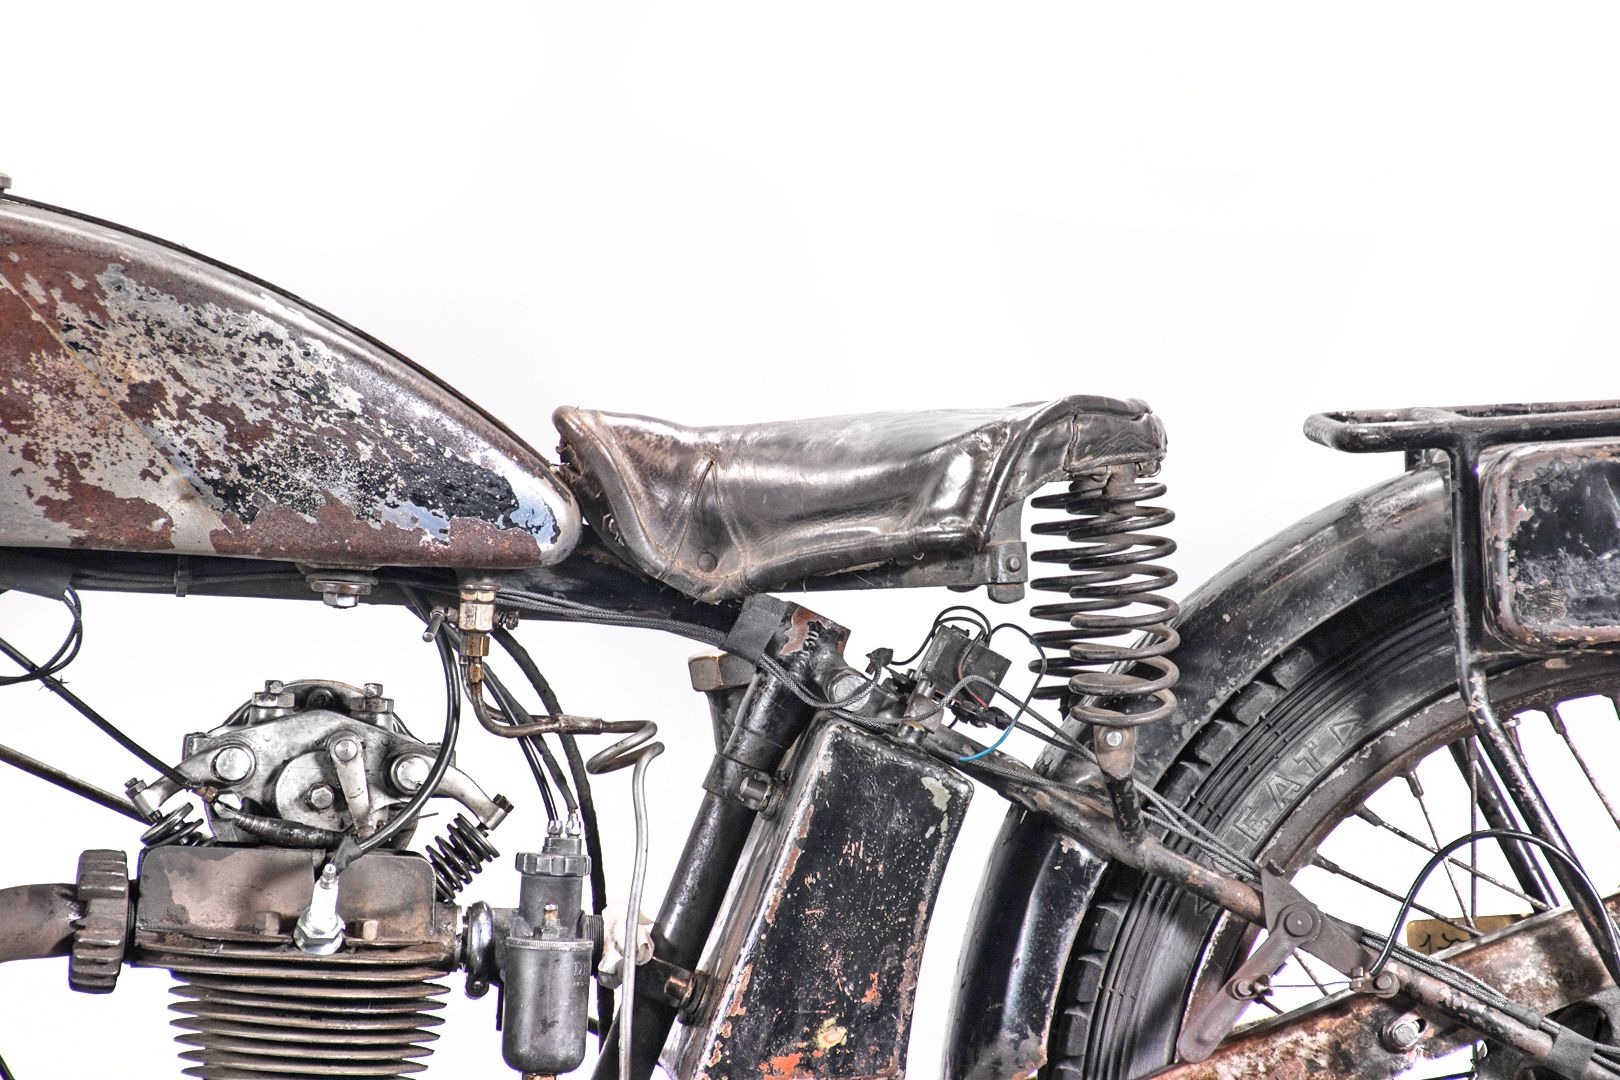 1938 Benelli 175 74494